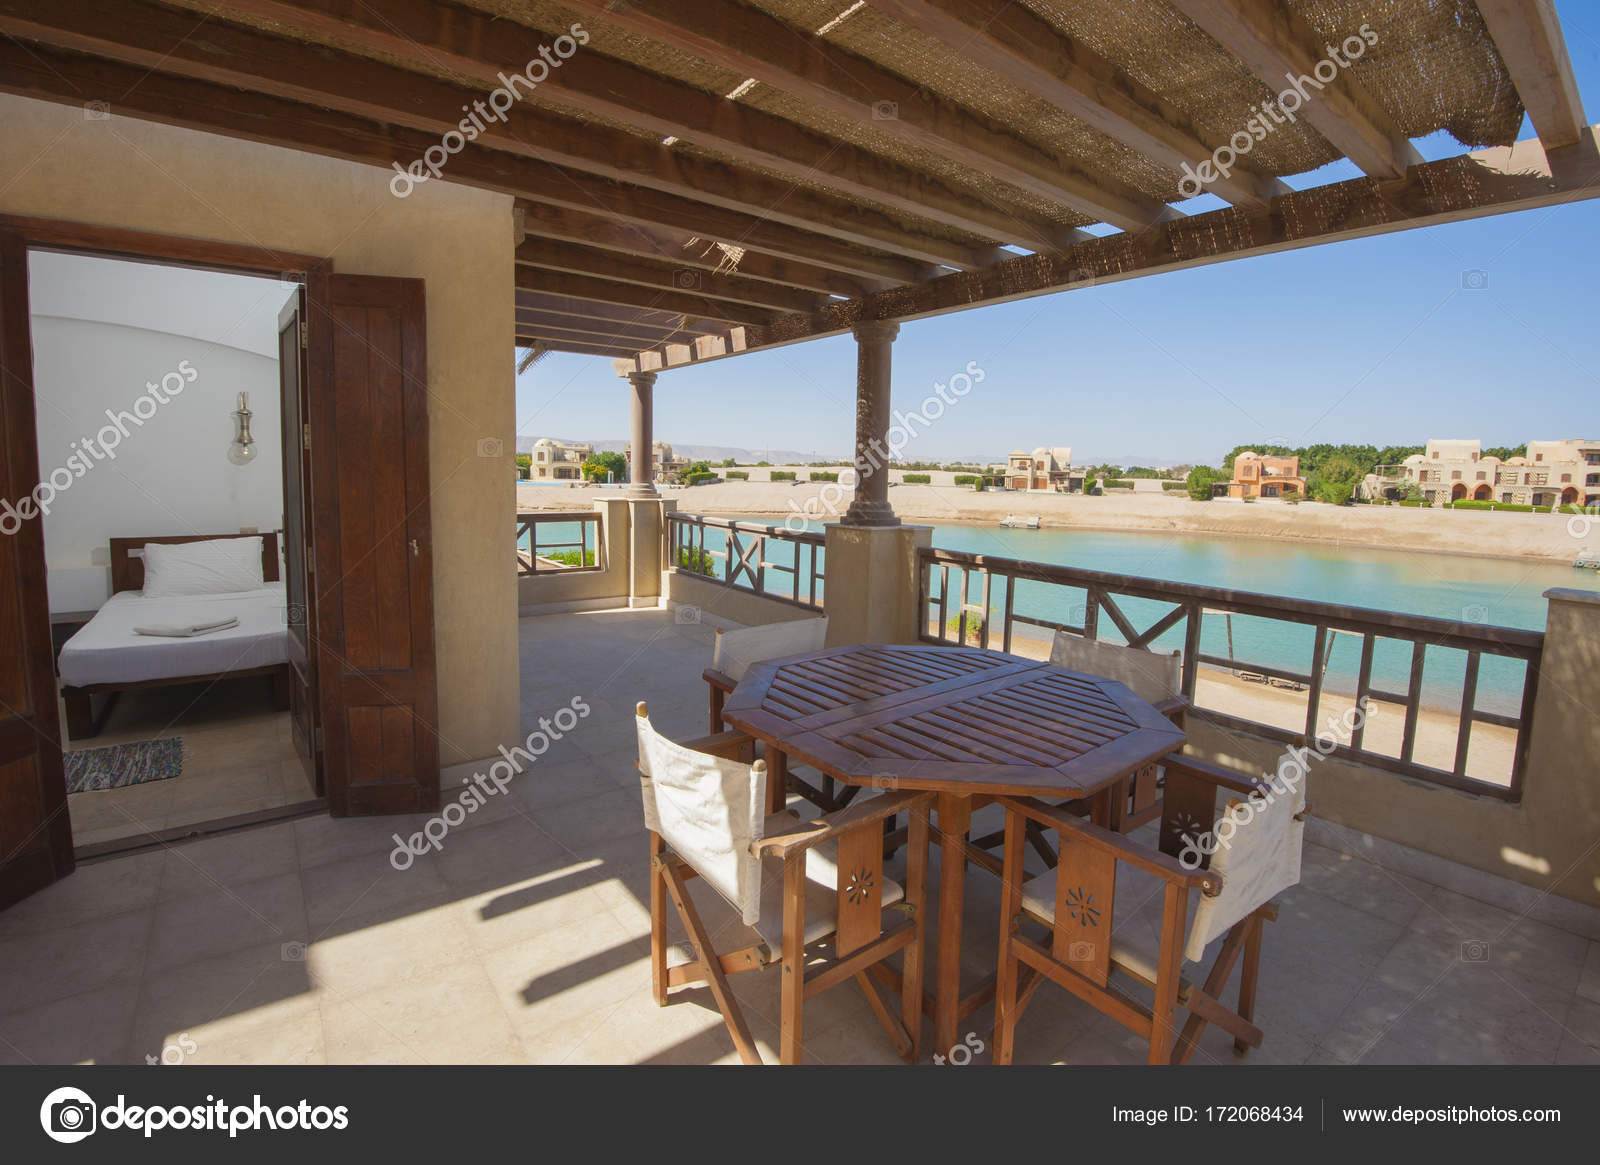 https://st3.depositphotos.com/1016811/17206/i/1600/depositphotos_172068434-stockafbeelding-terras-balkon-slaapkamer-met-stoelen.jpg